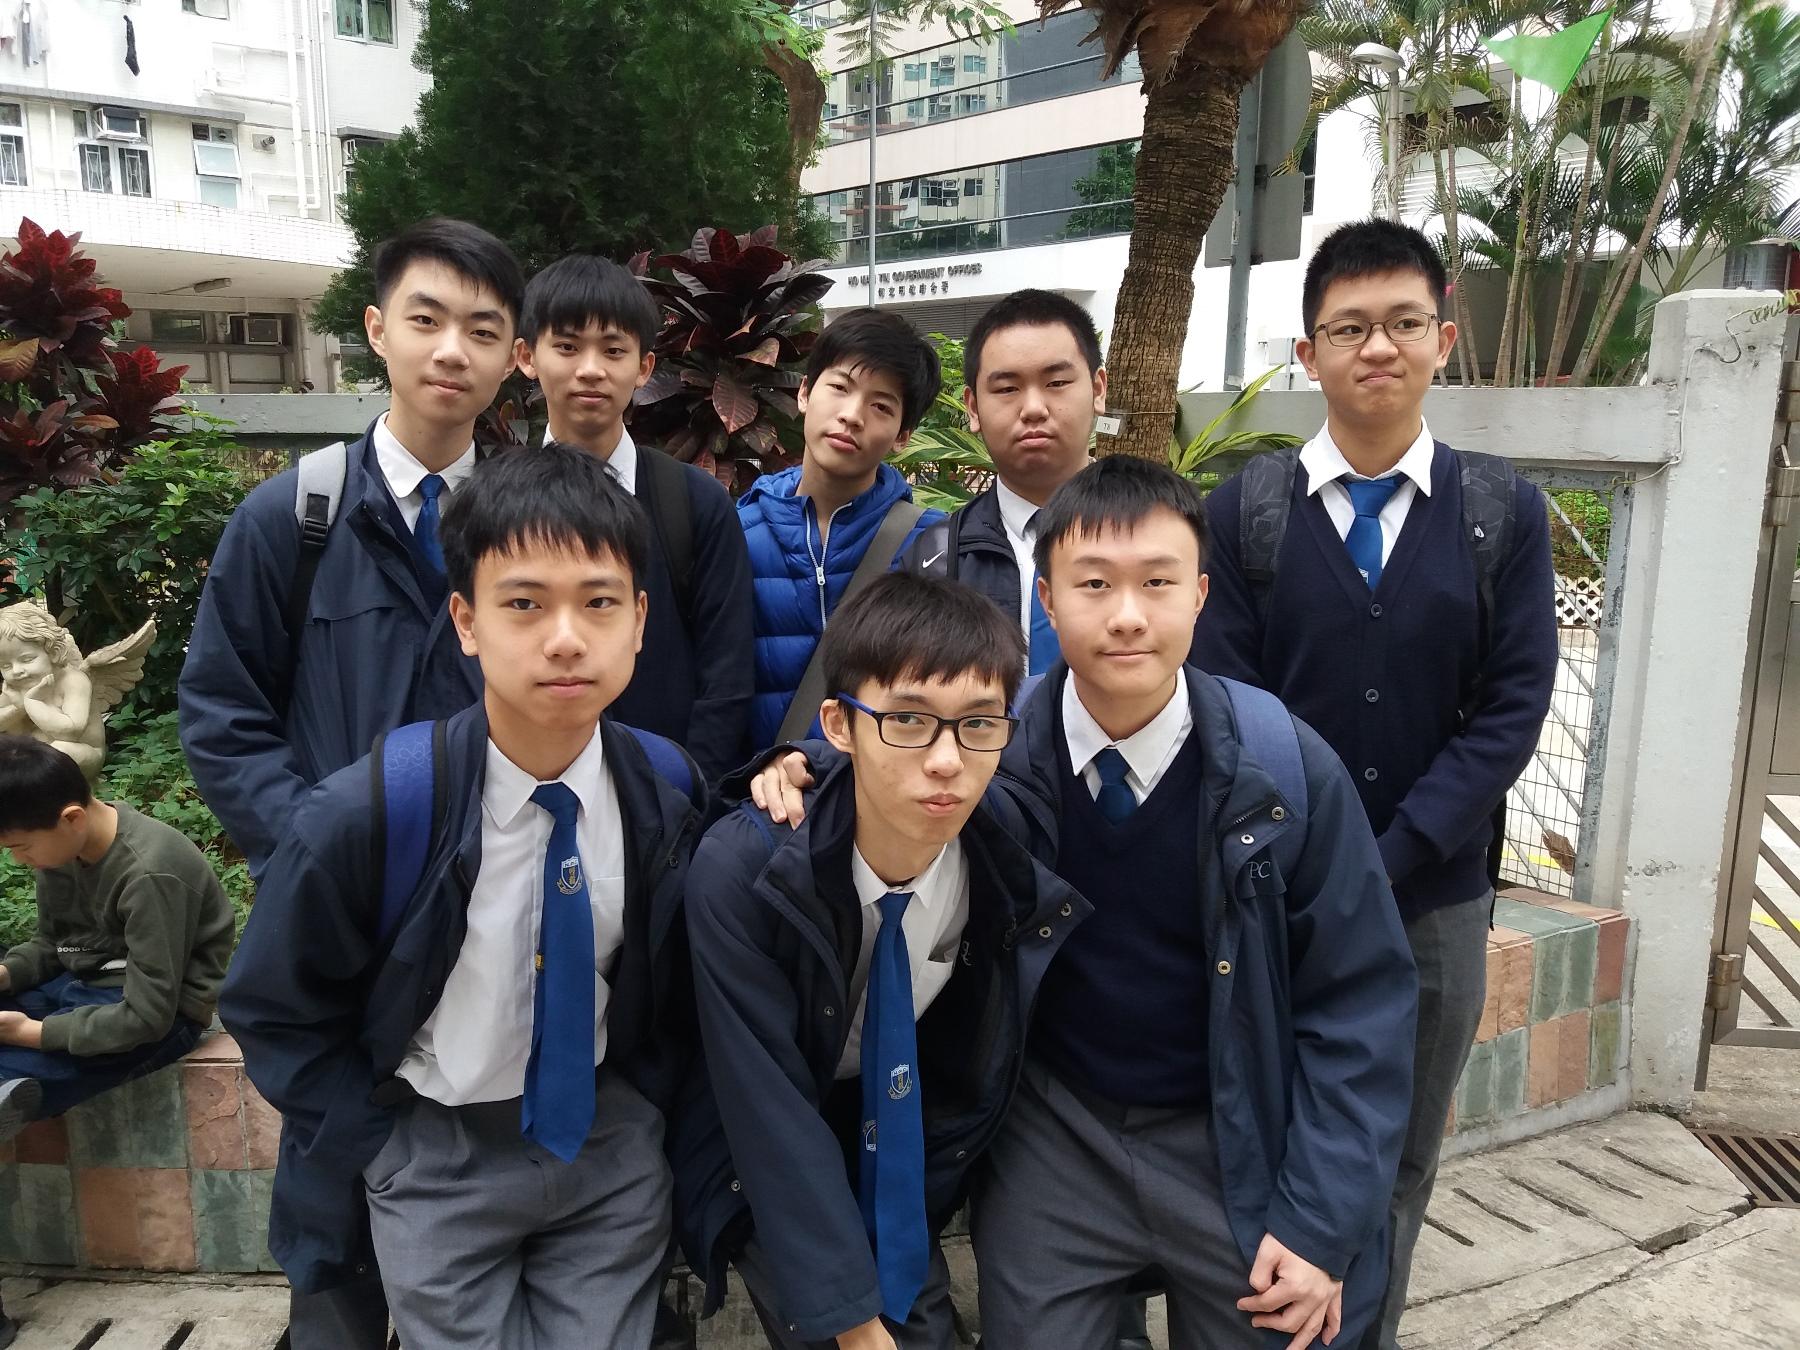 http://npc.edu.hk/sites/default/files/20191215_105119.jpg